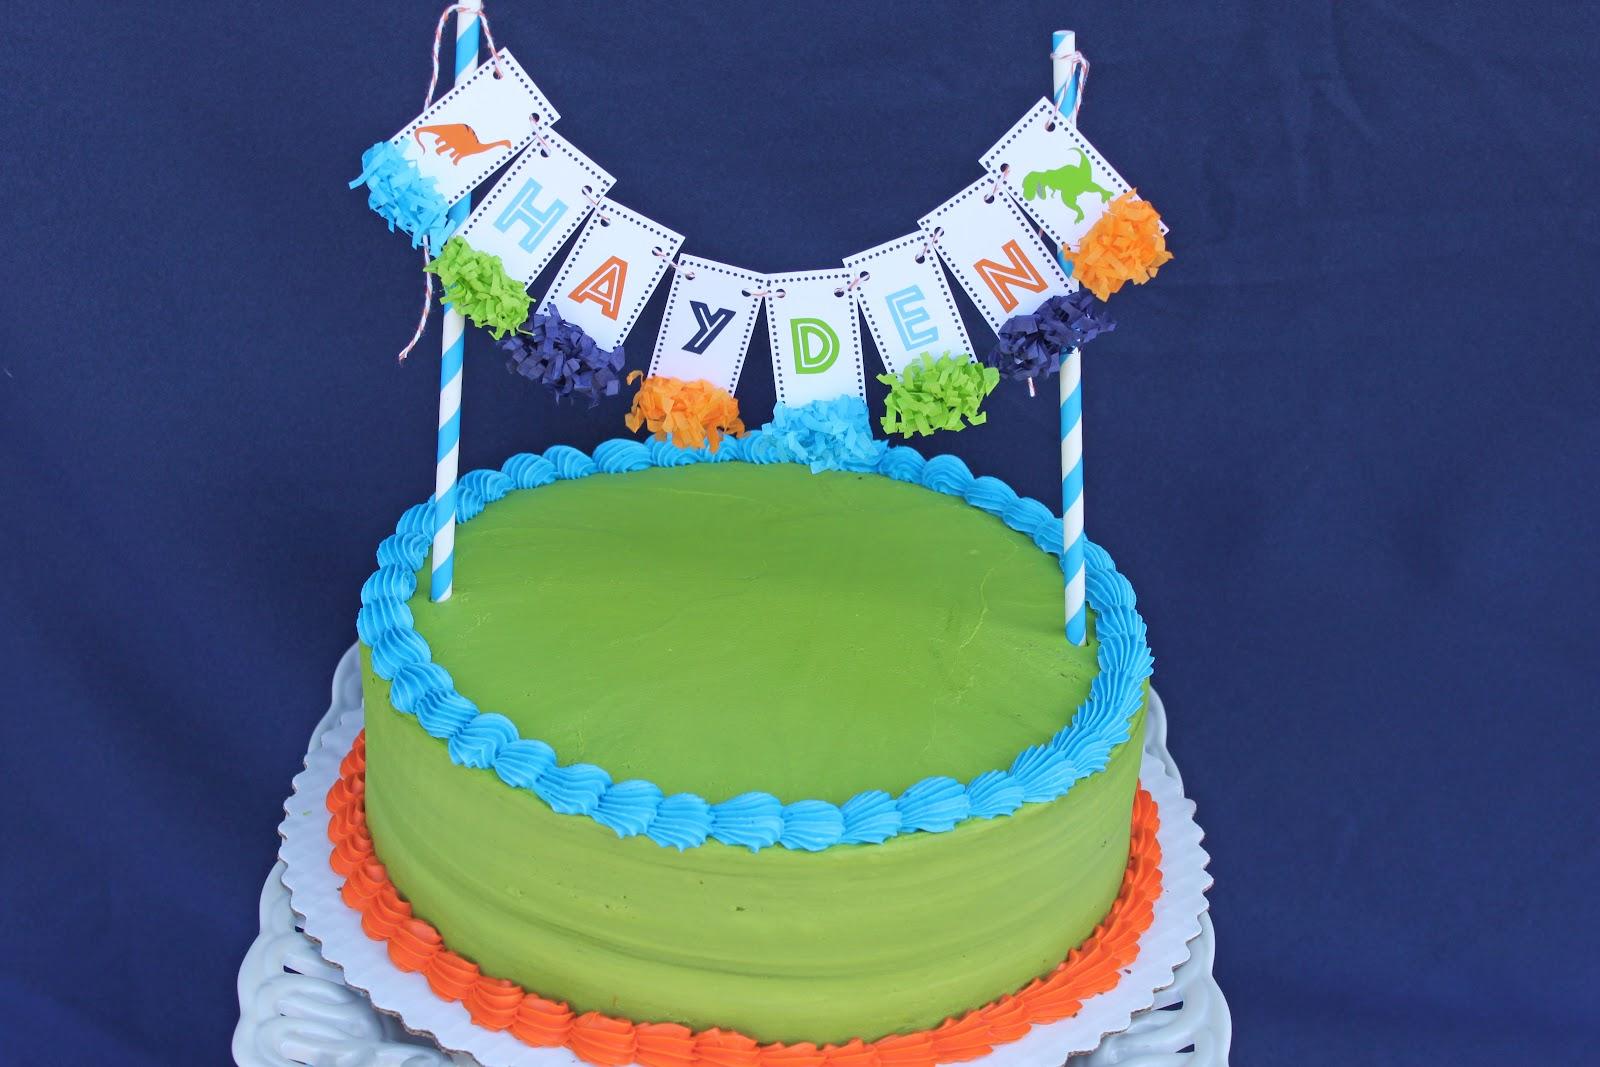 Fred Meyers Cake Order